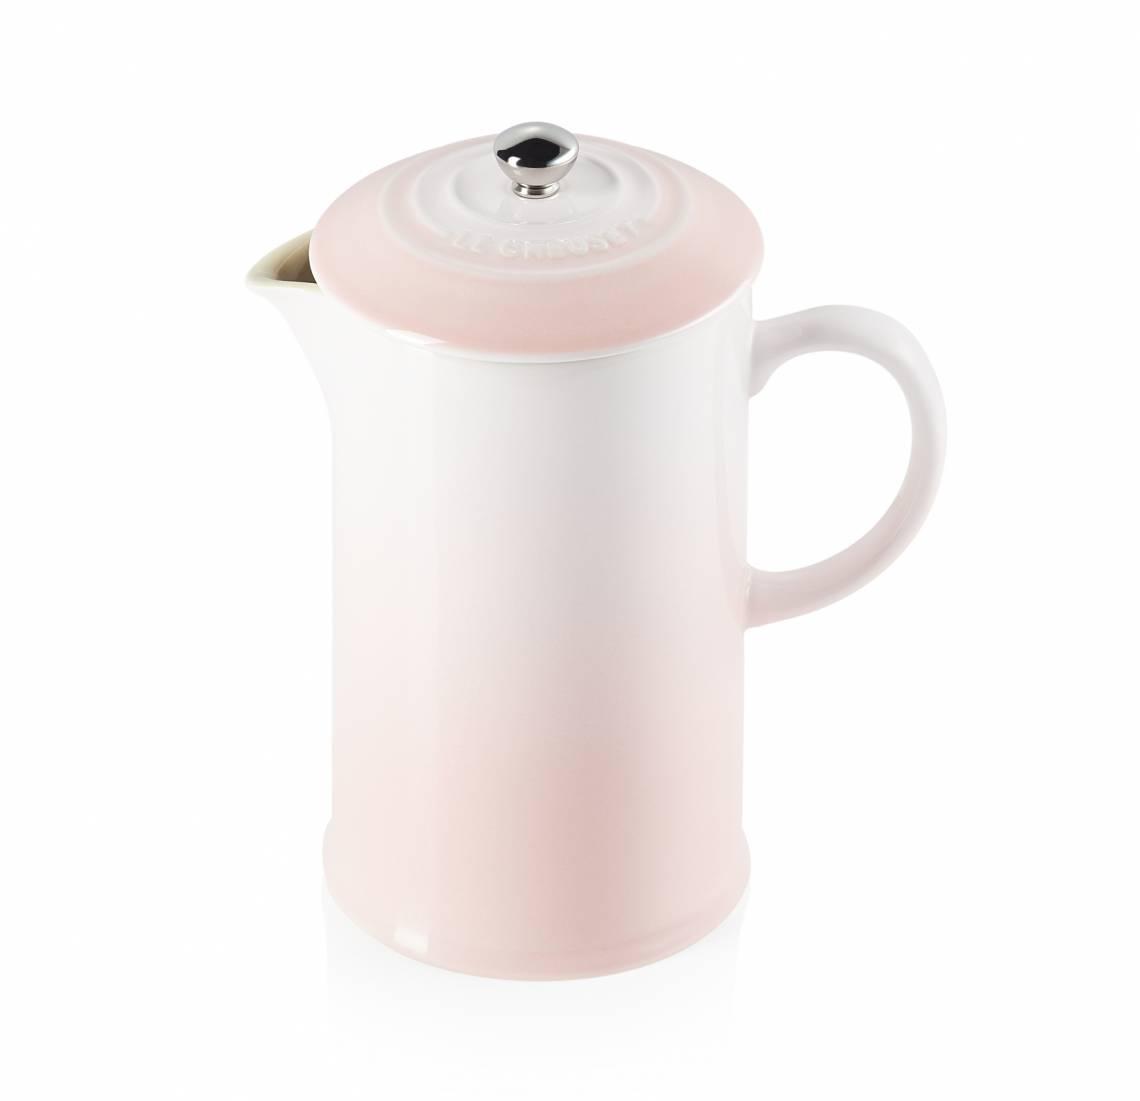 Le_Creuset_Kaffee-Bereiter_Shell_Pink